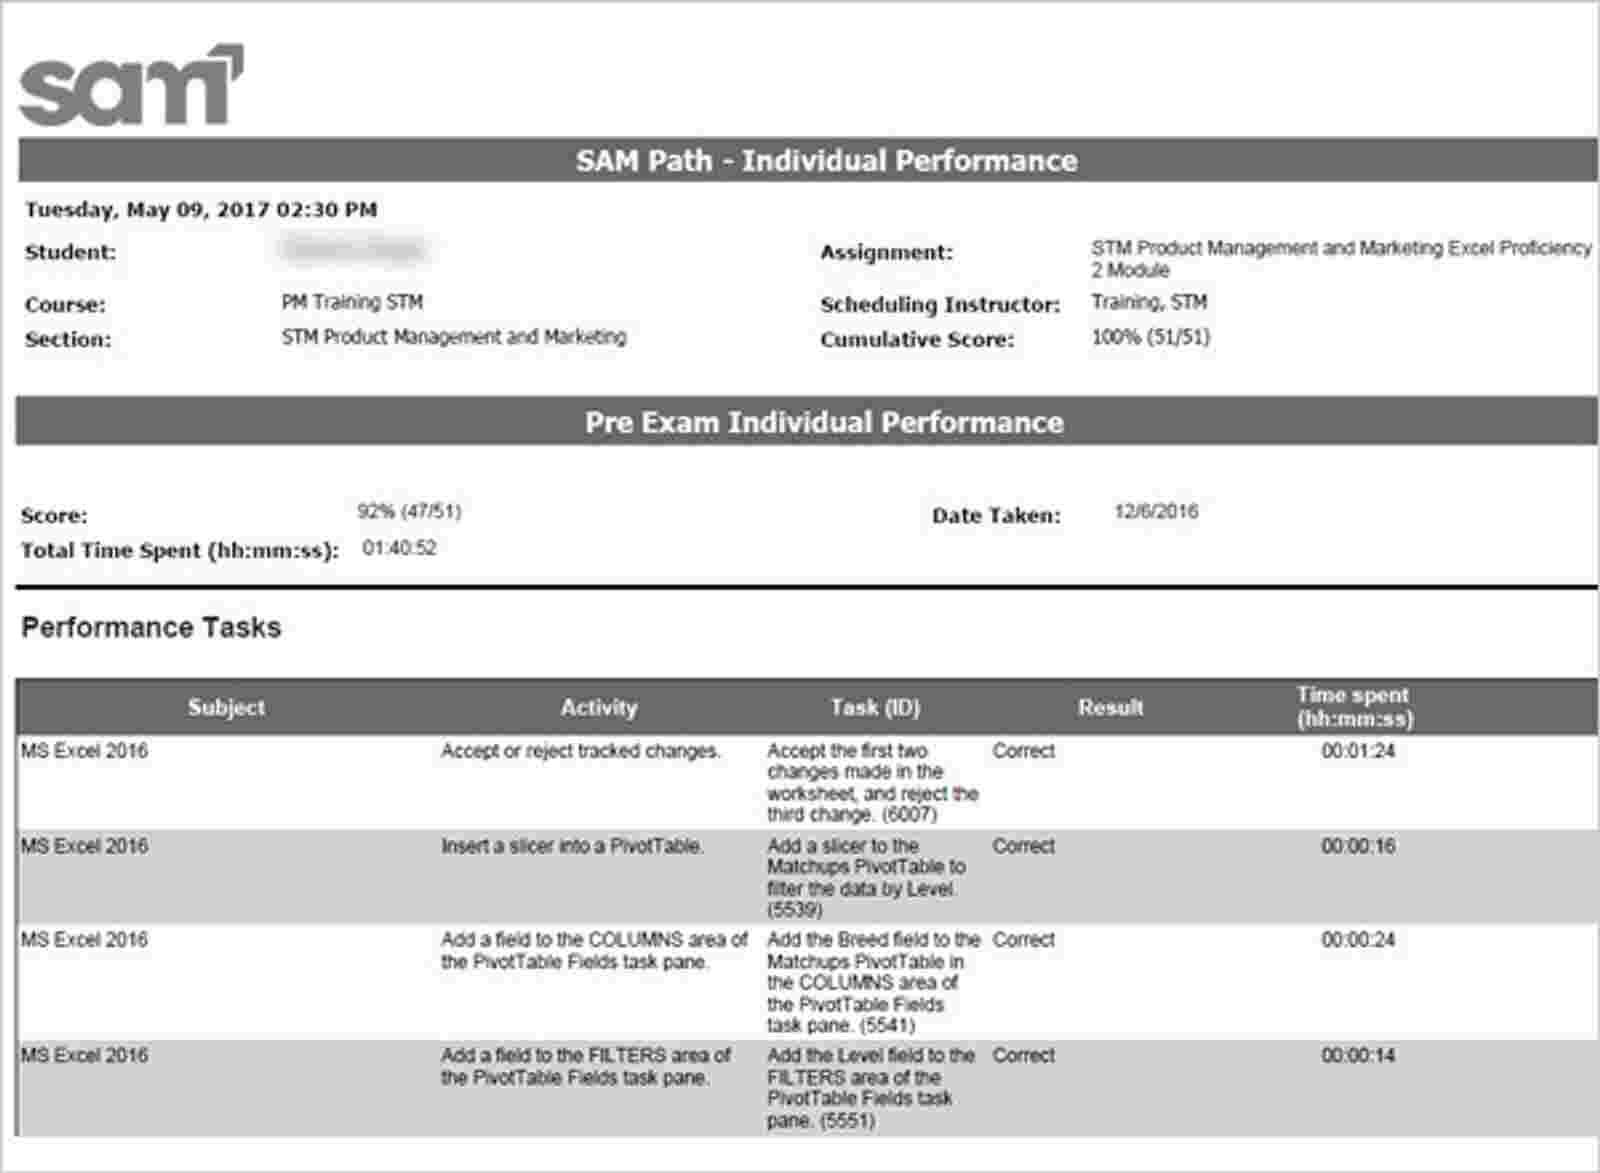 SAM individual performance report image